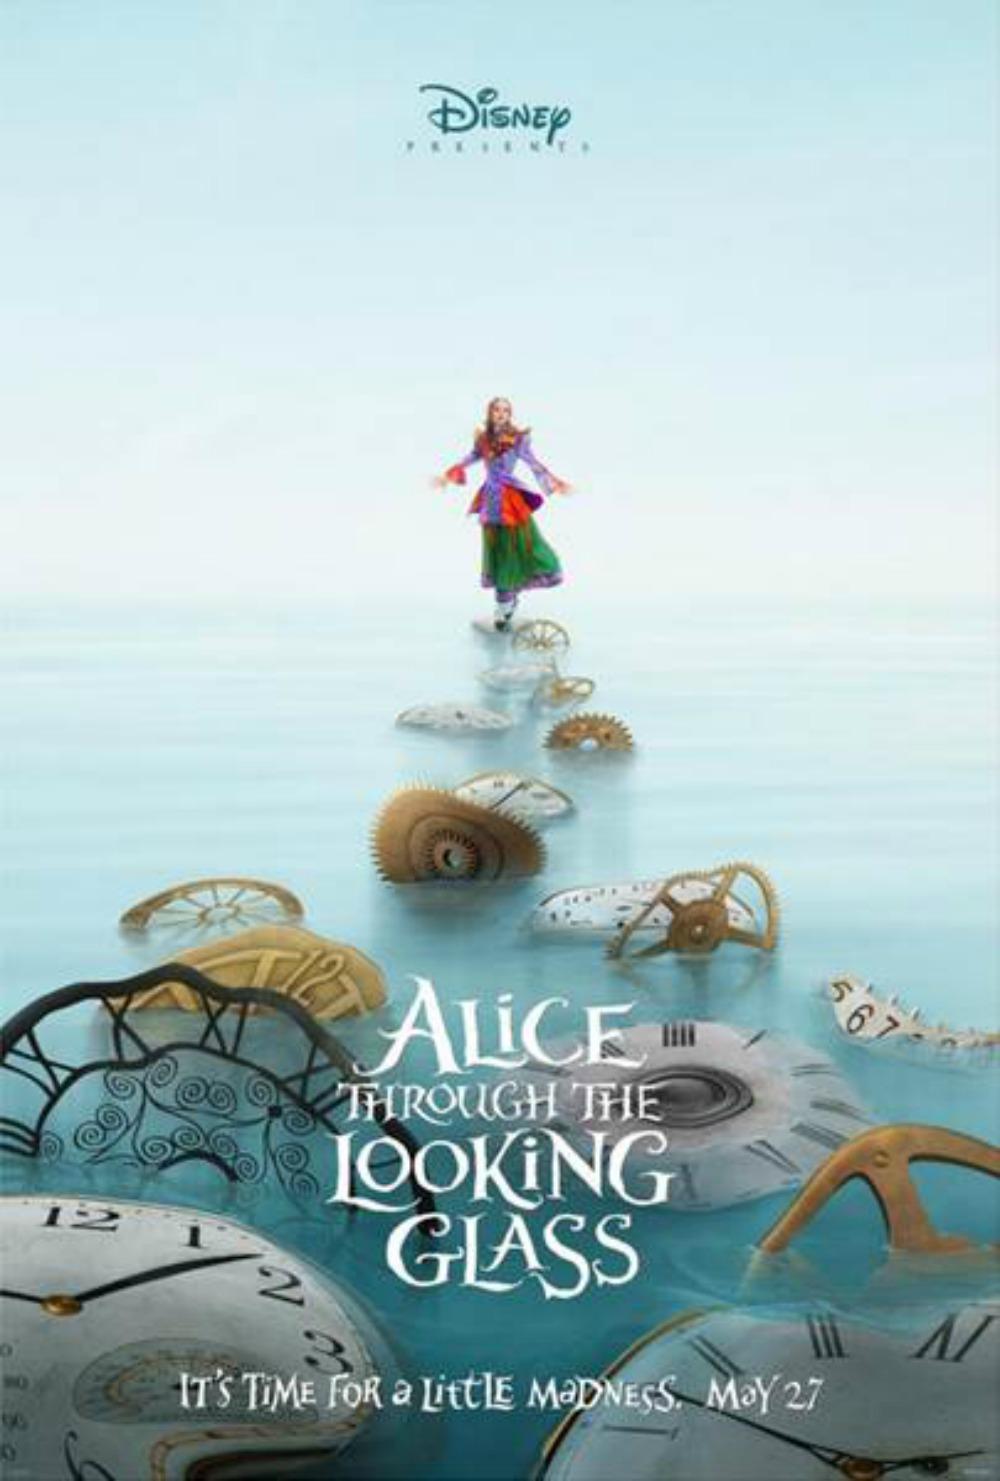 Alice Through the Looking Glass Trailer Teaser #DisneyAlice